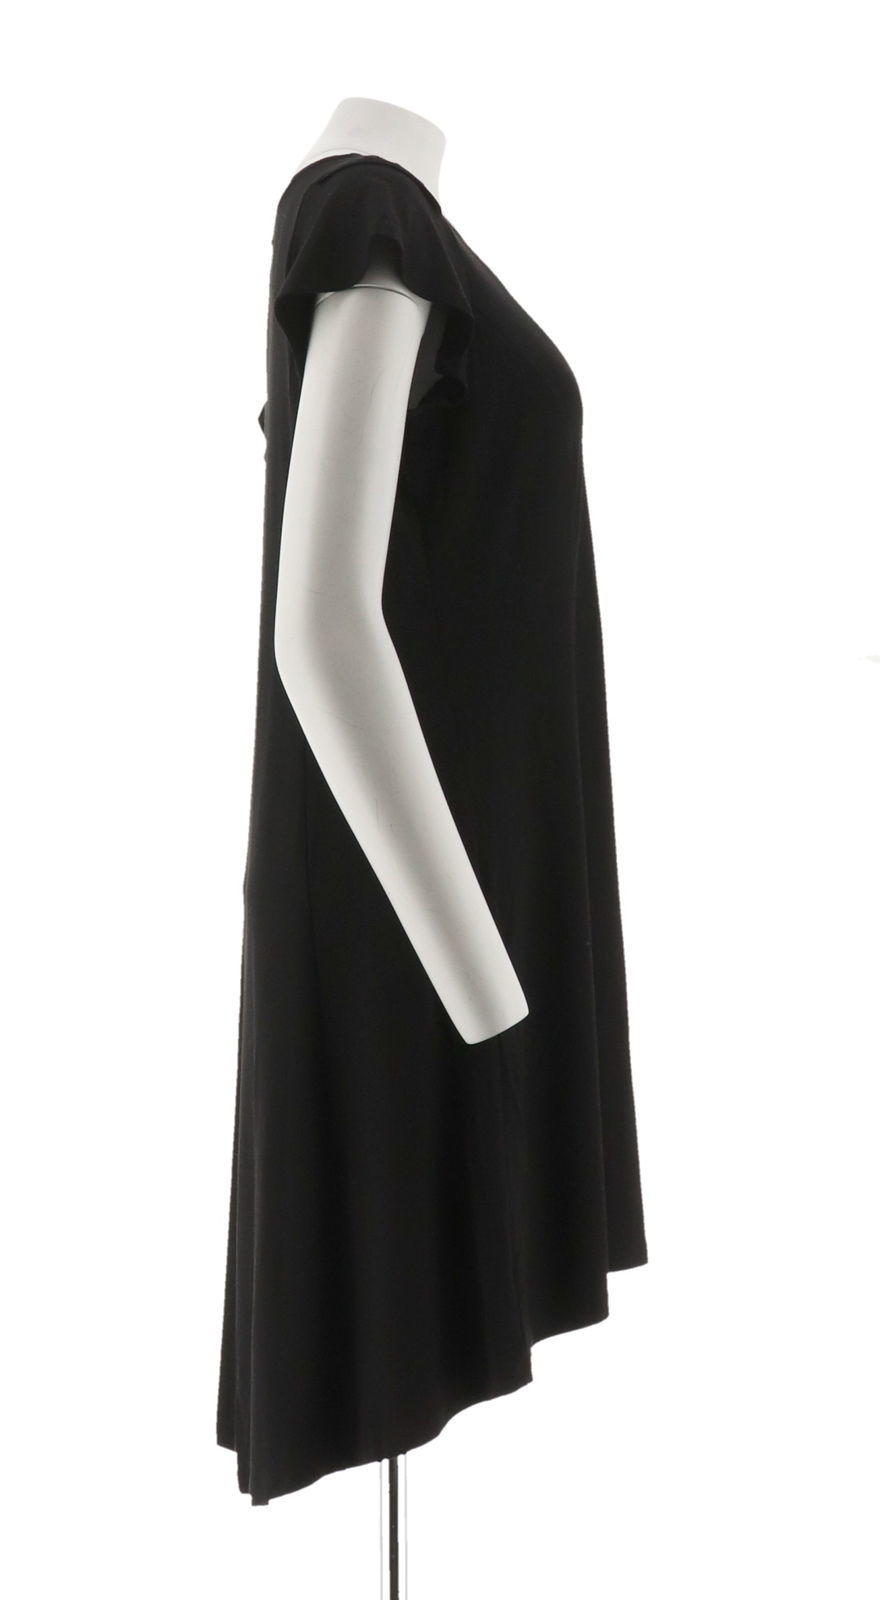 H Halston Petite Knit Crepe Dress Cutout Black PS NEW A308103 image 4